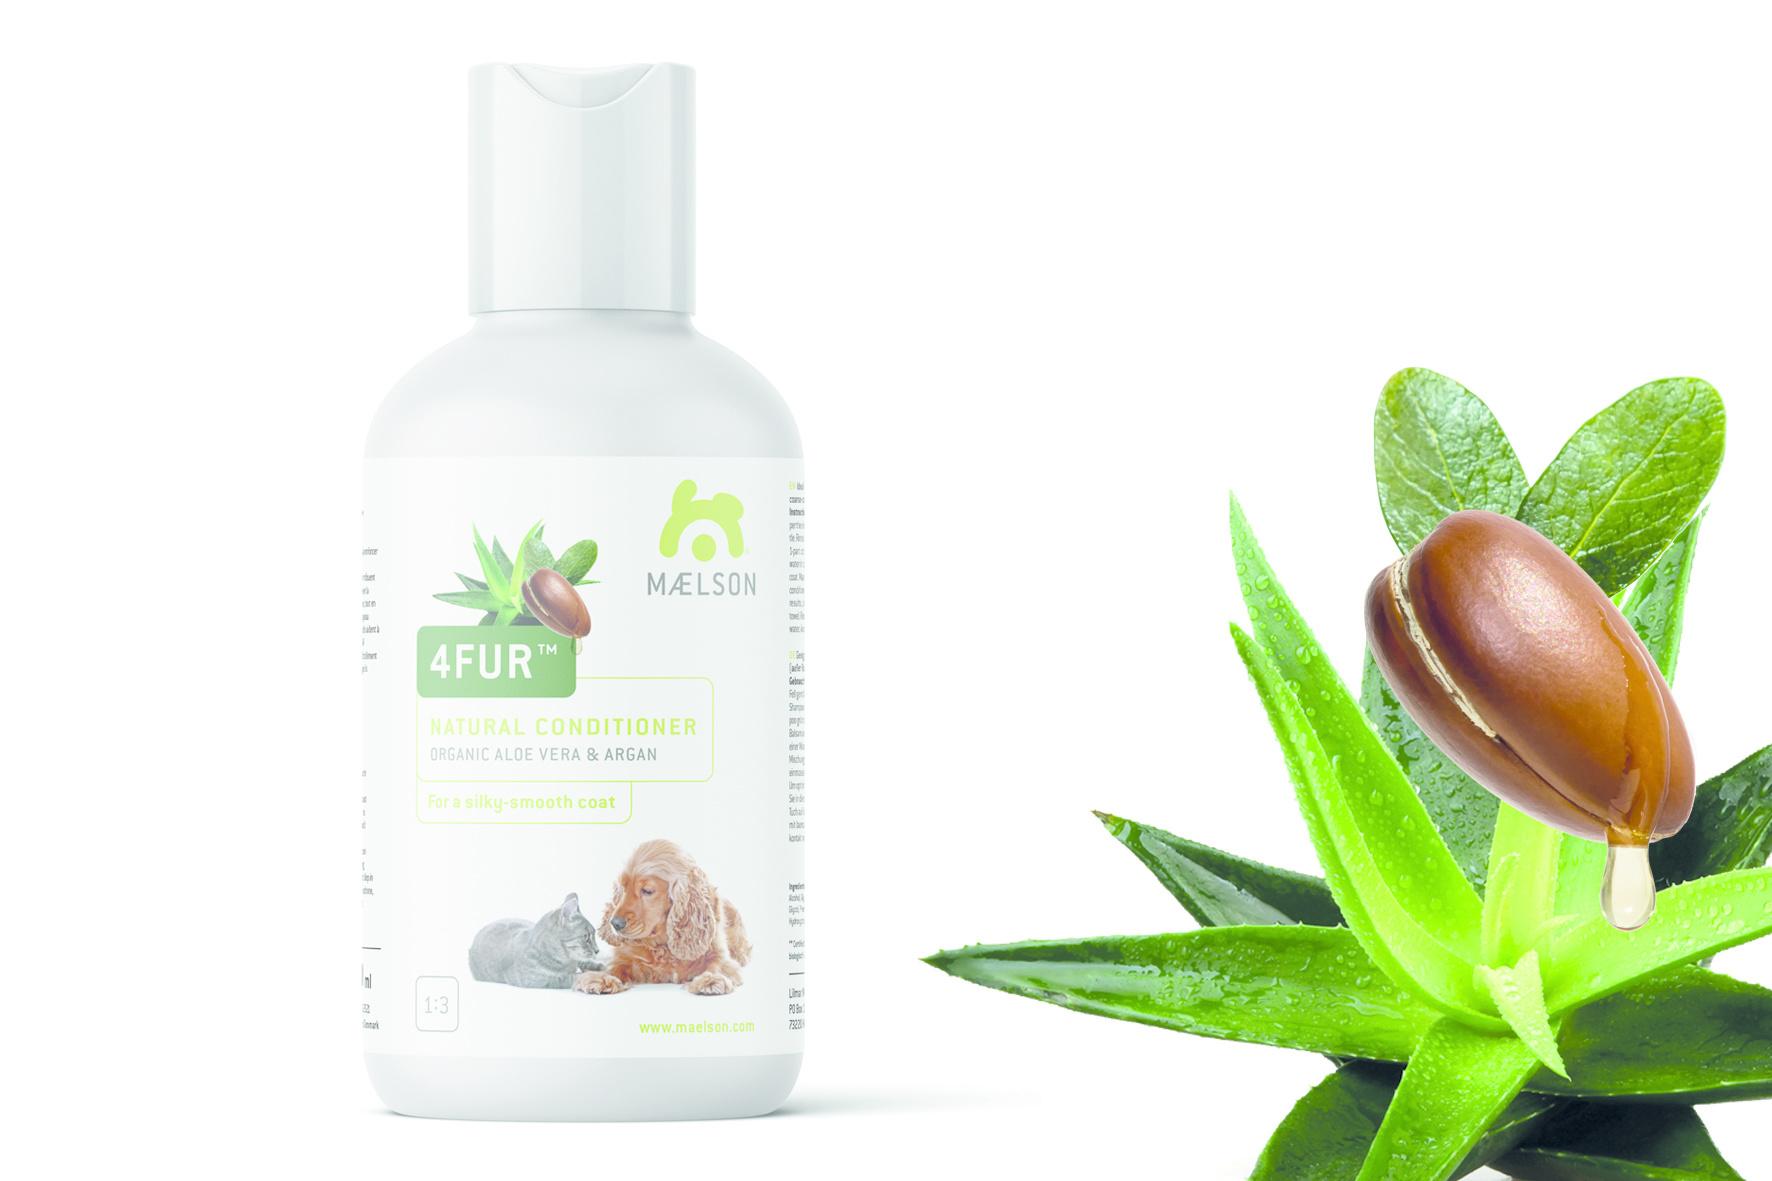 Maelson 4Fur™ Coconut & Jojoba shampoo